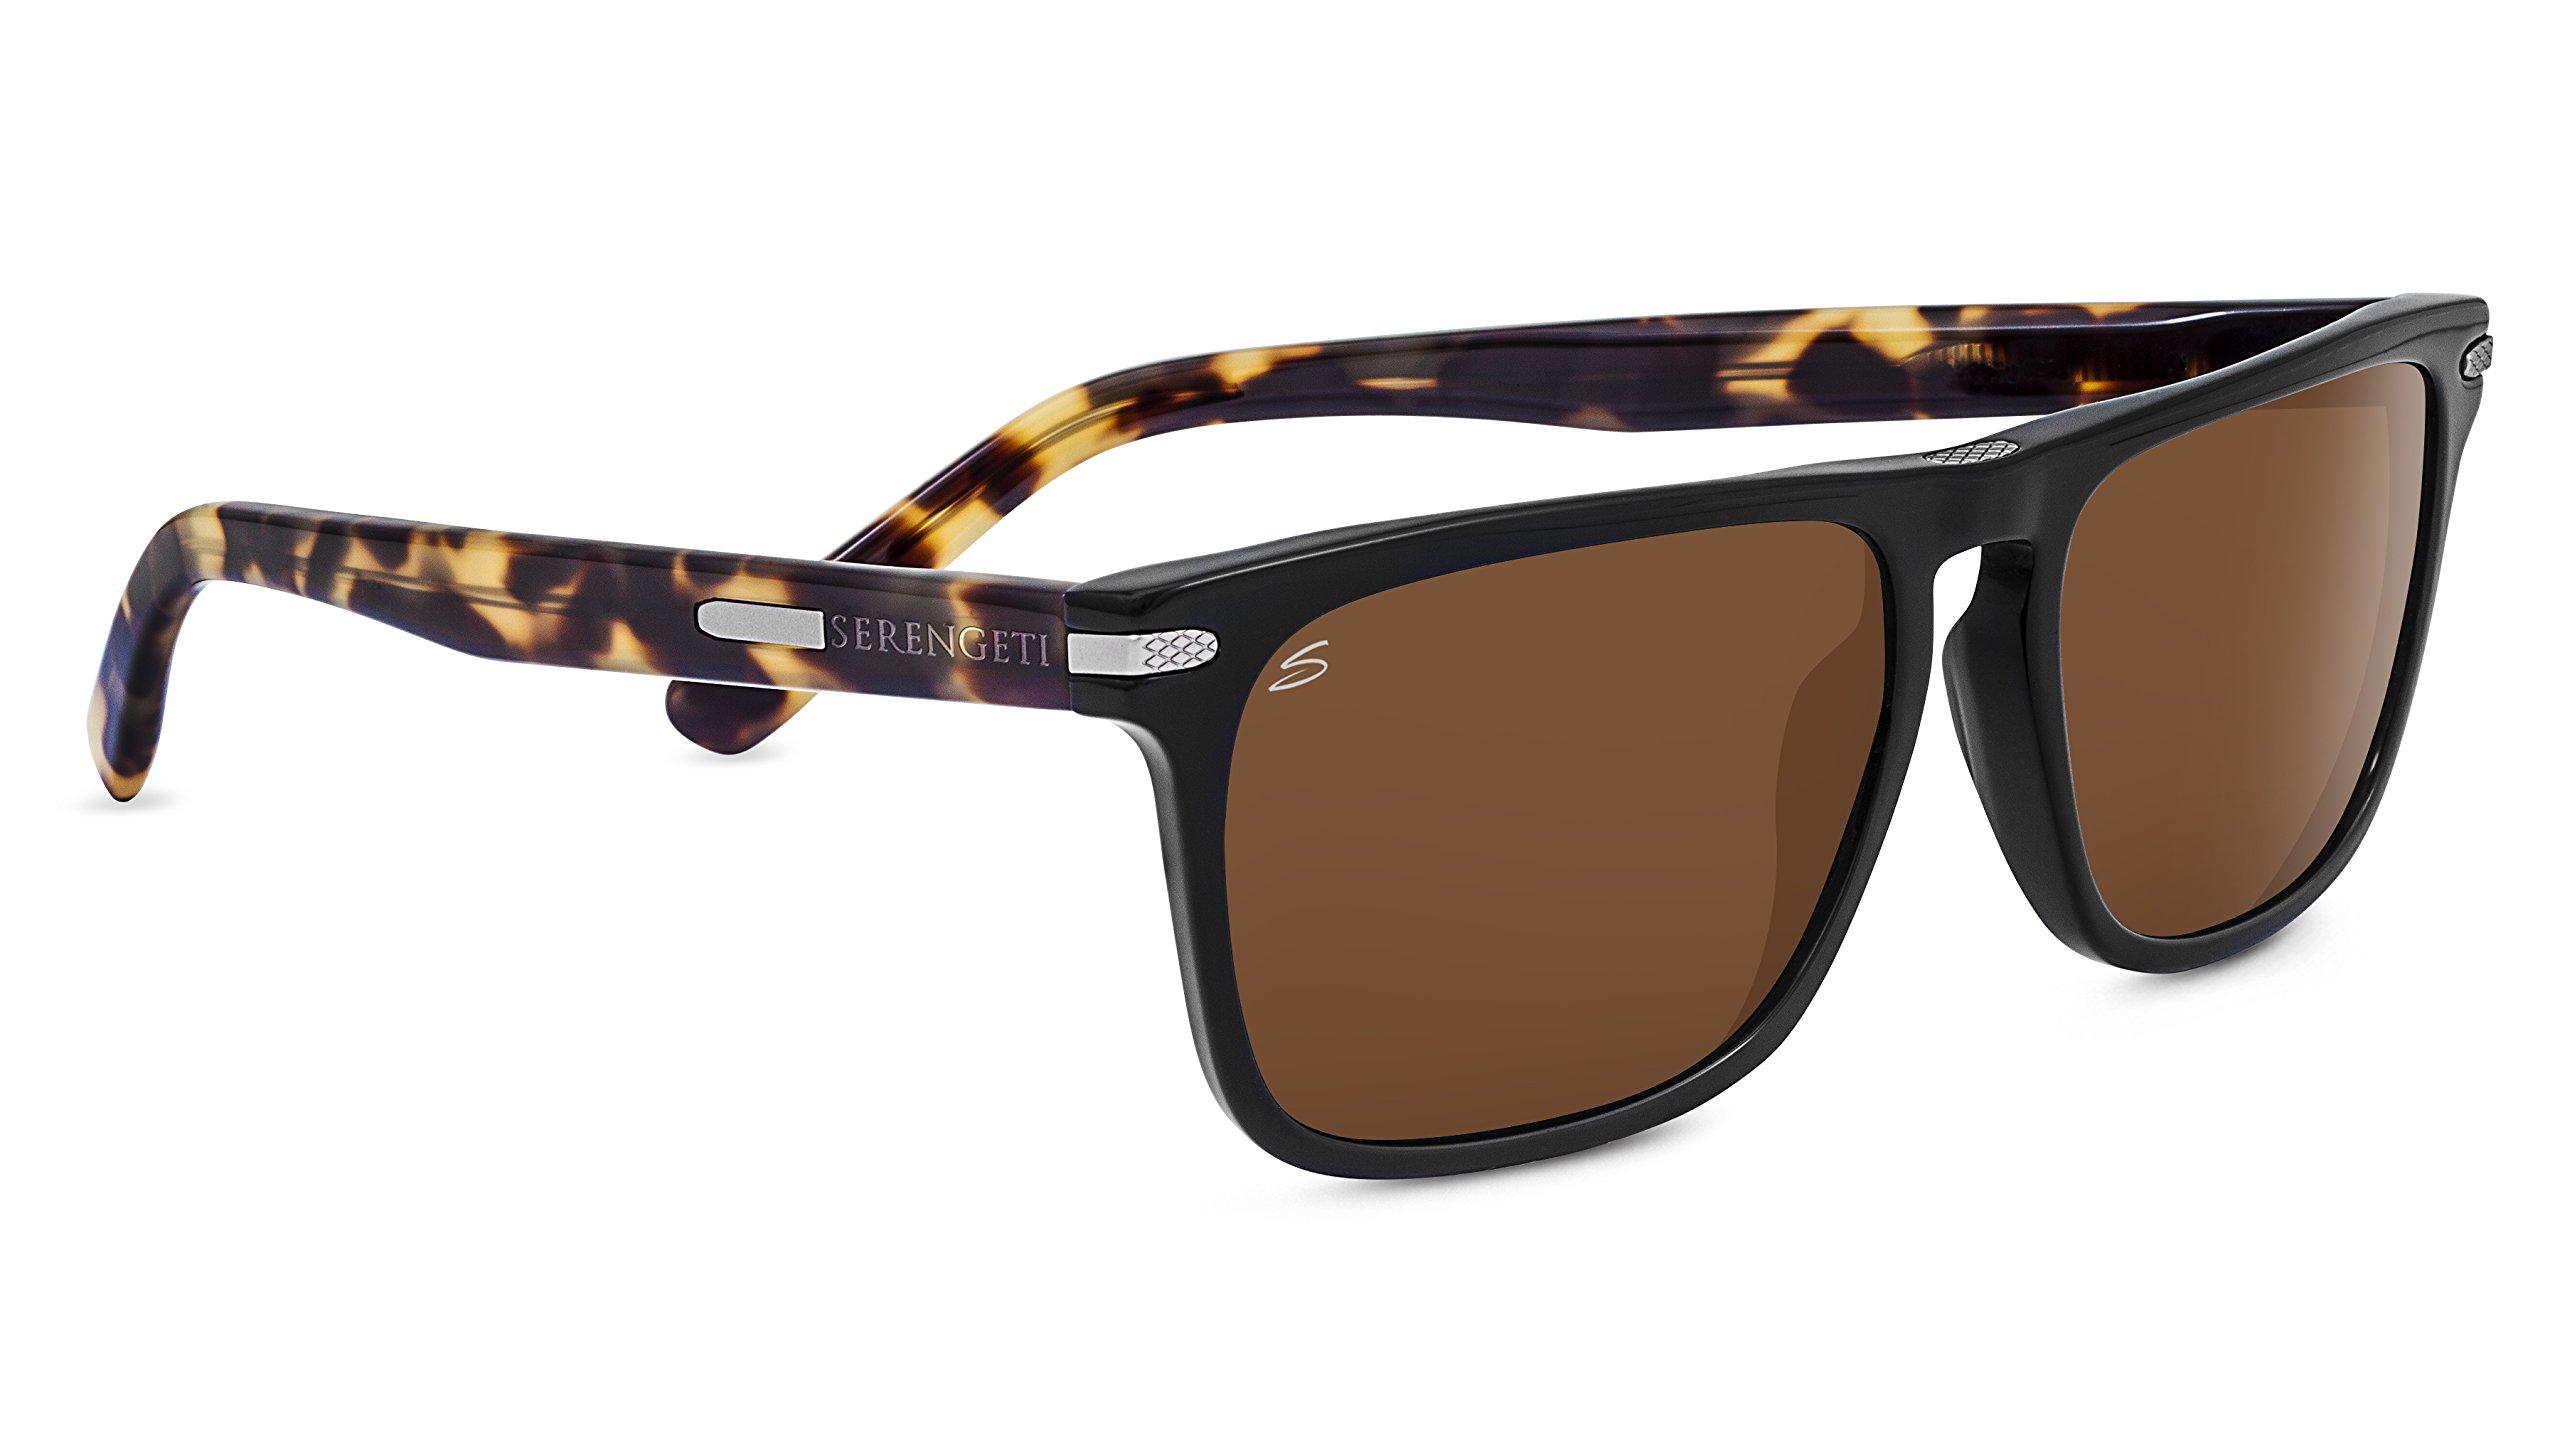 Serengeti 8323-Carlo Large Carlo Large Glasses, Black/Mossy Oak by Serengeti